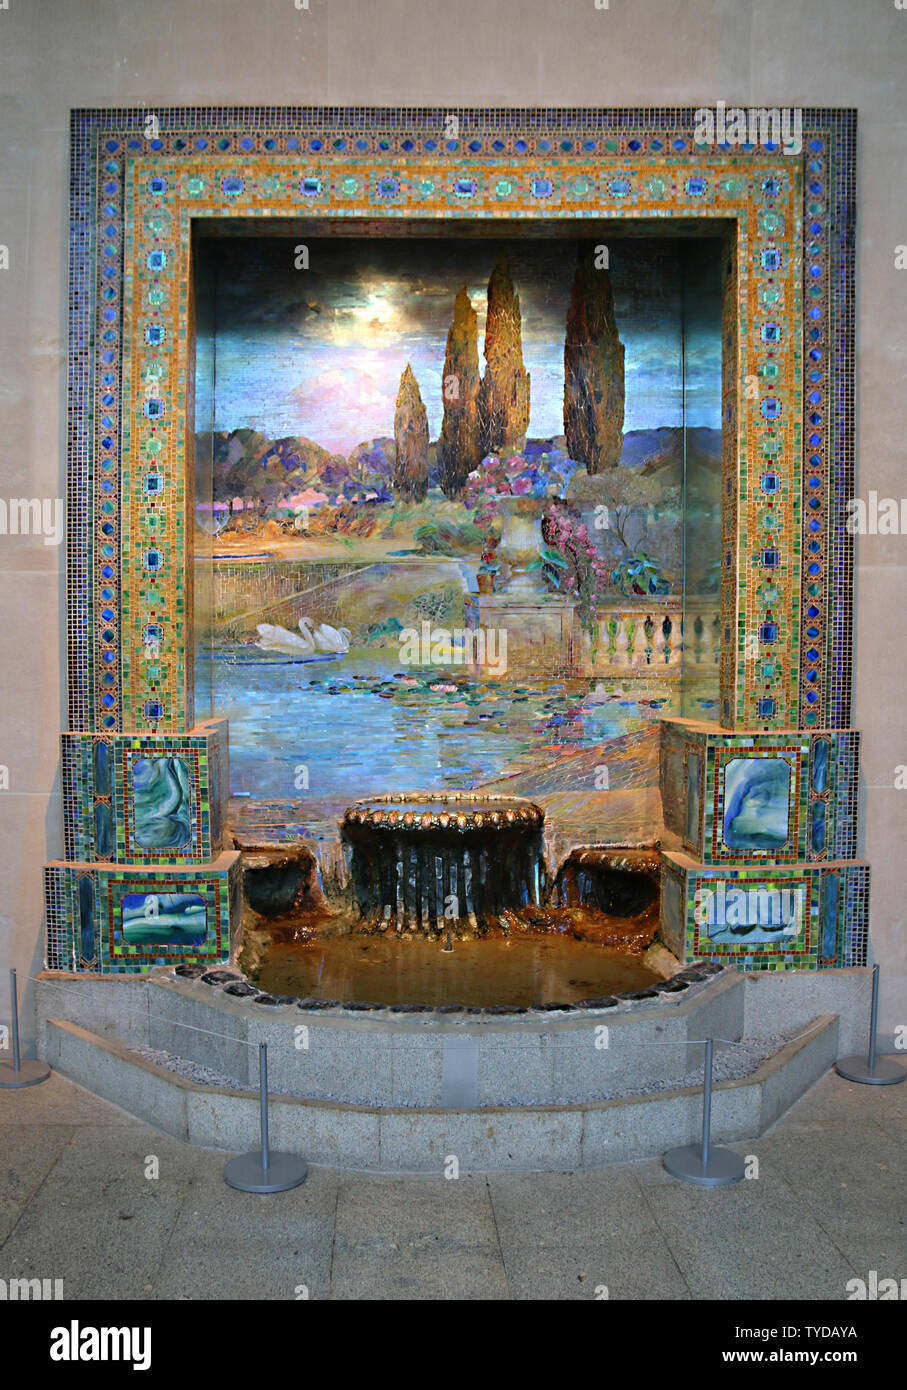 "Louis Comfort Tiffany's ""Garden Landscape"", Metropolitan Museum of Art, New York City, New York, USA - preliminiary studio for ""Dream Garden"" mosaic Stock Photo"